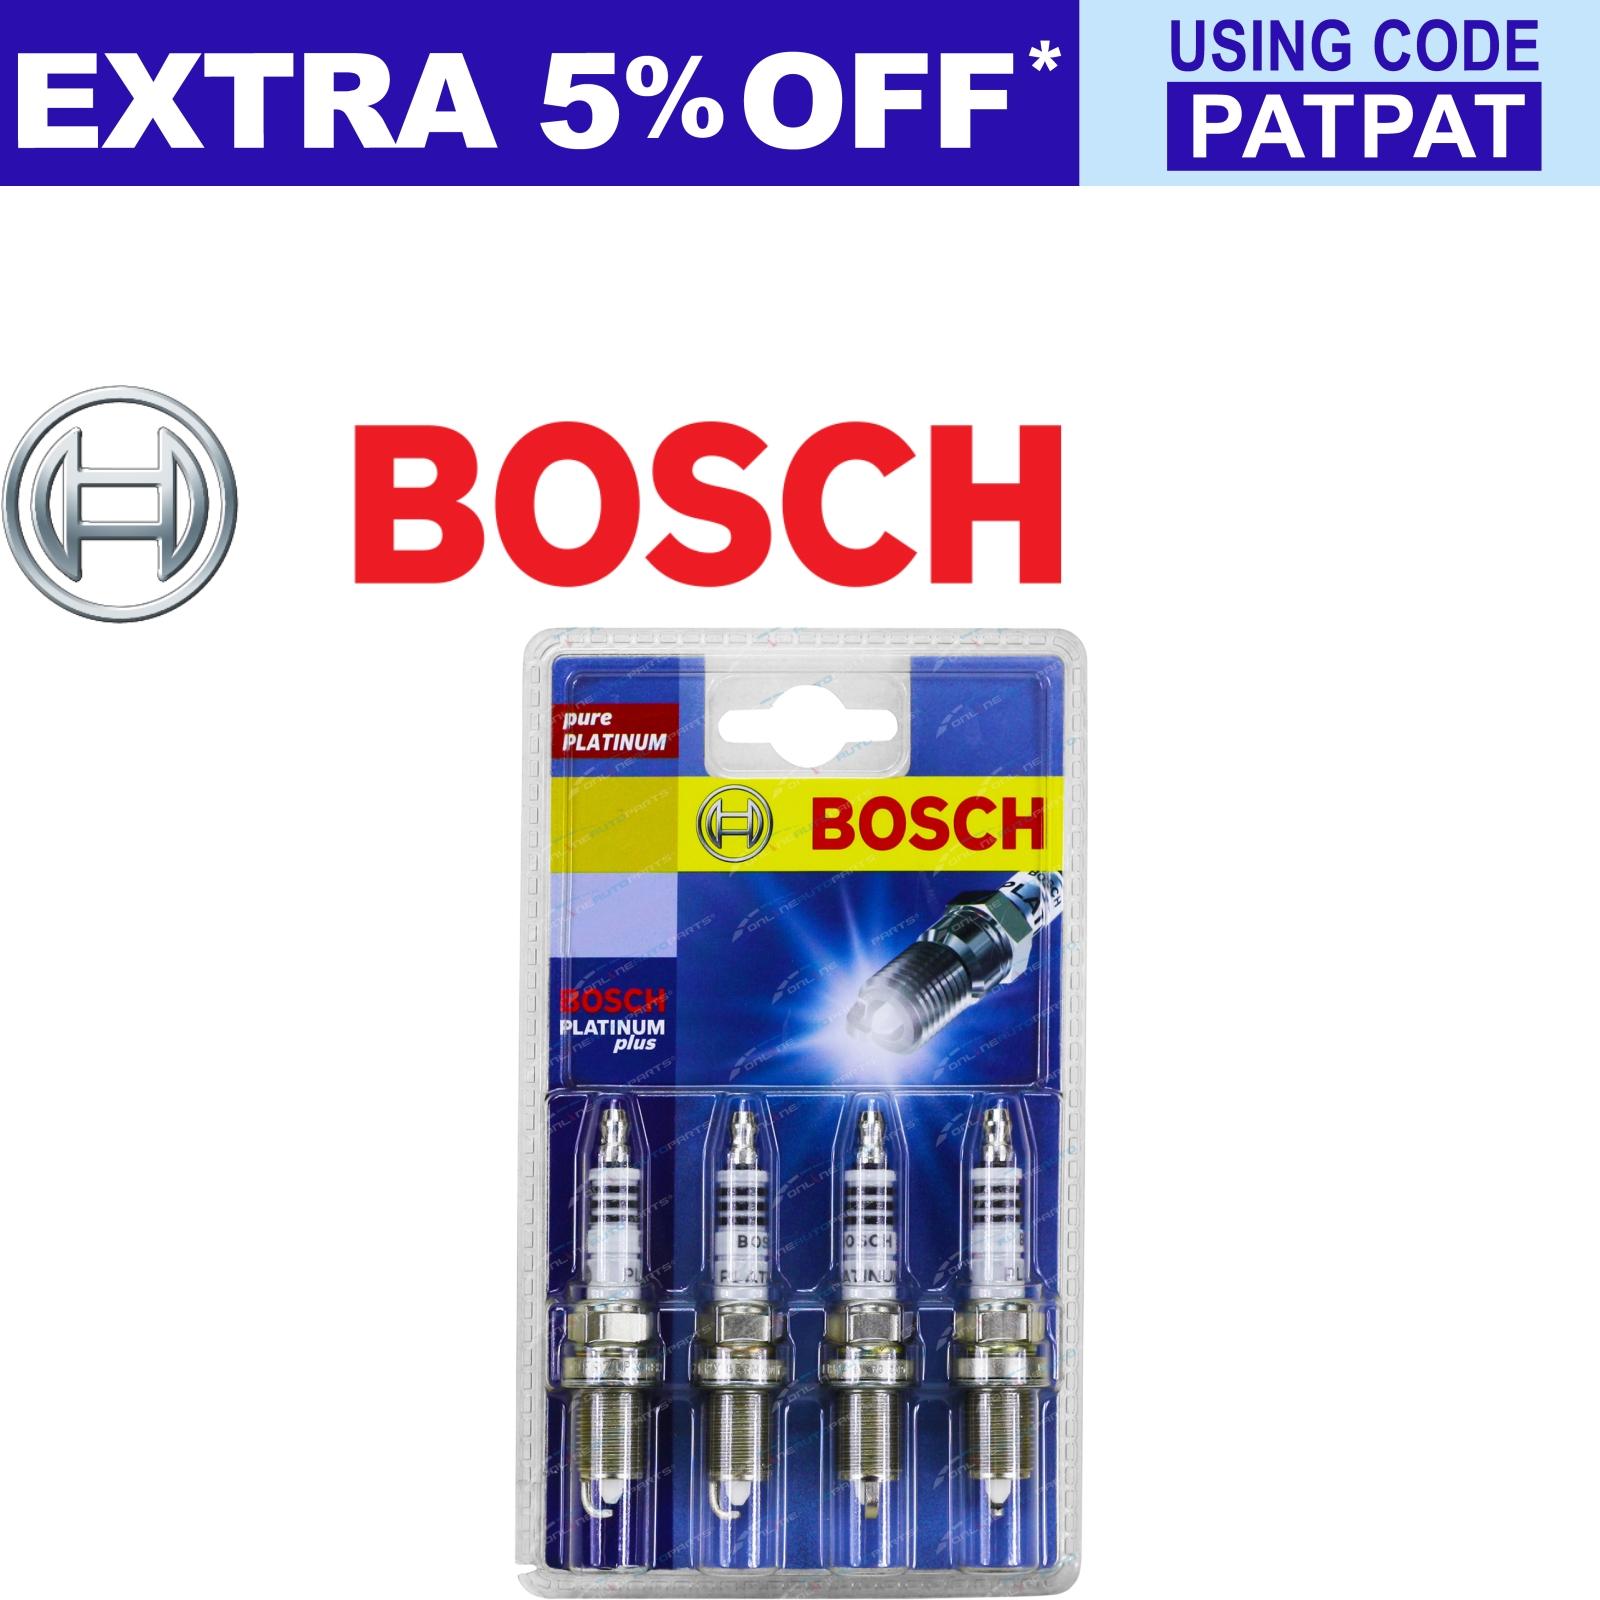 Set-of-4-Bosch-Platinum-Spark-Plugs-for-Mazda-6-GG-Hatch-4cy-L3-2-3L-2002-2-2005